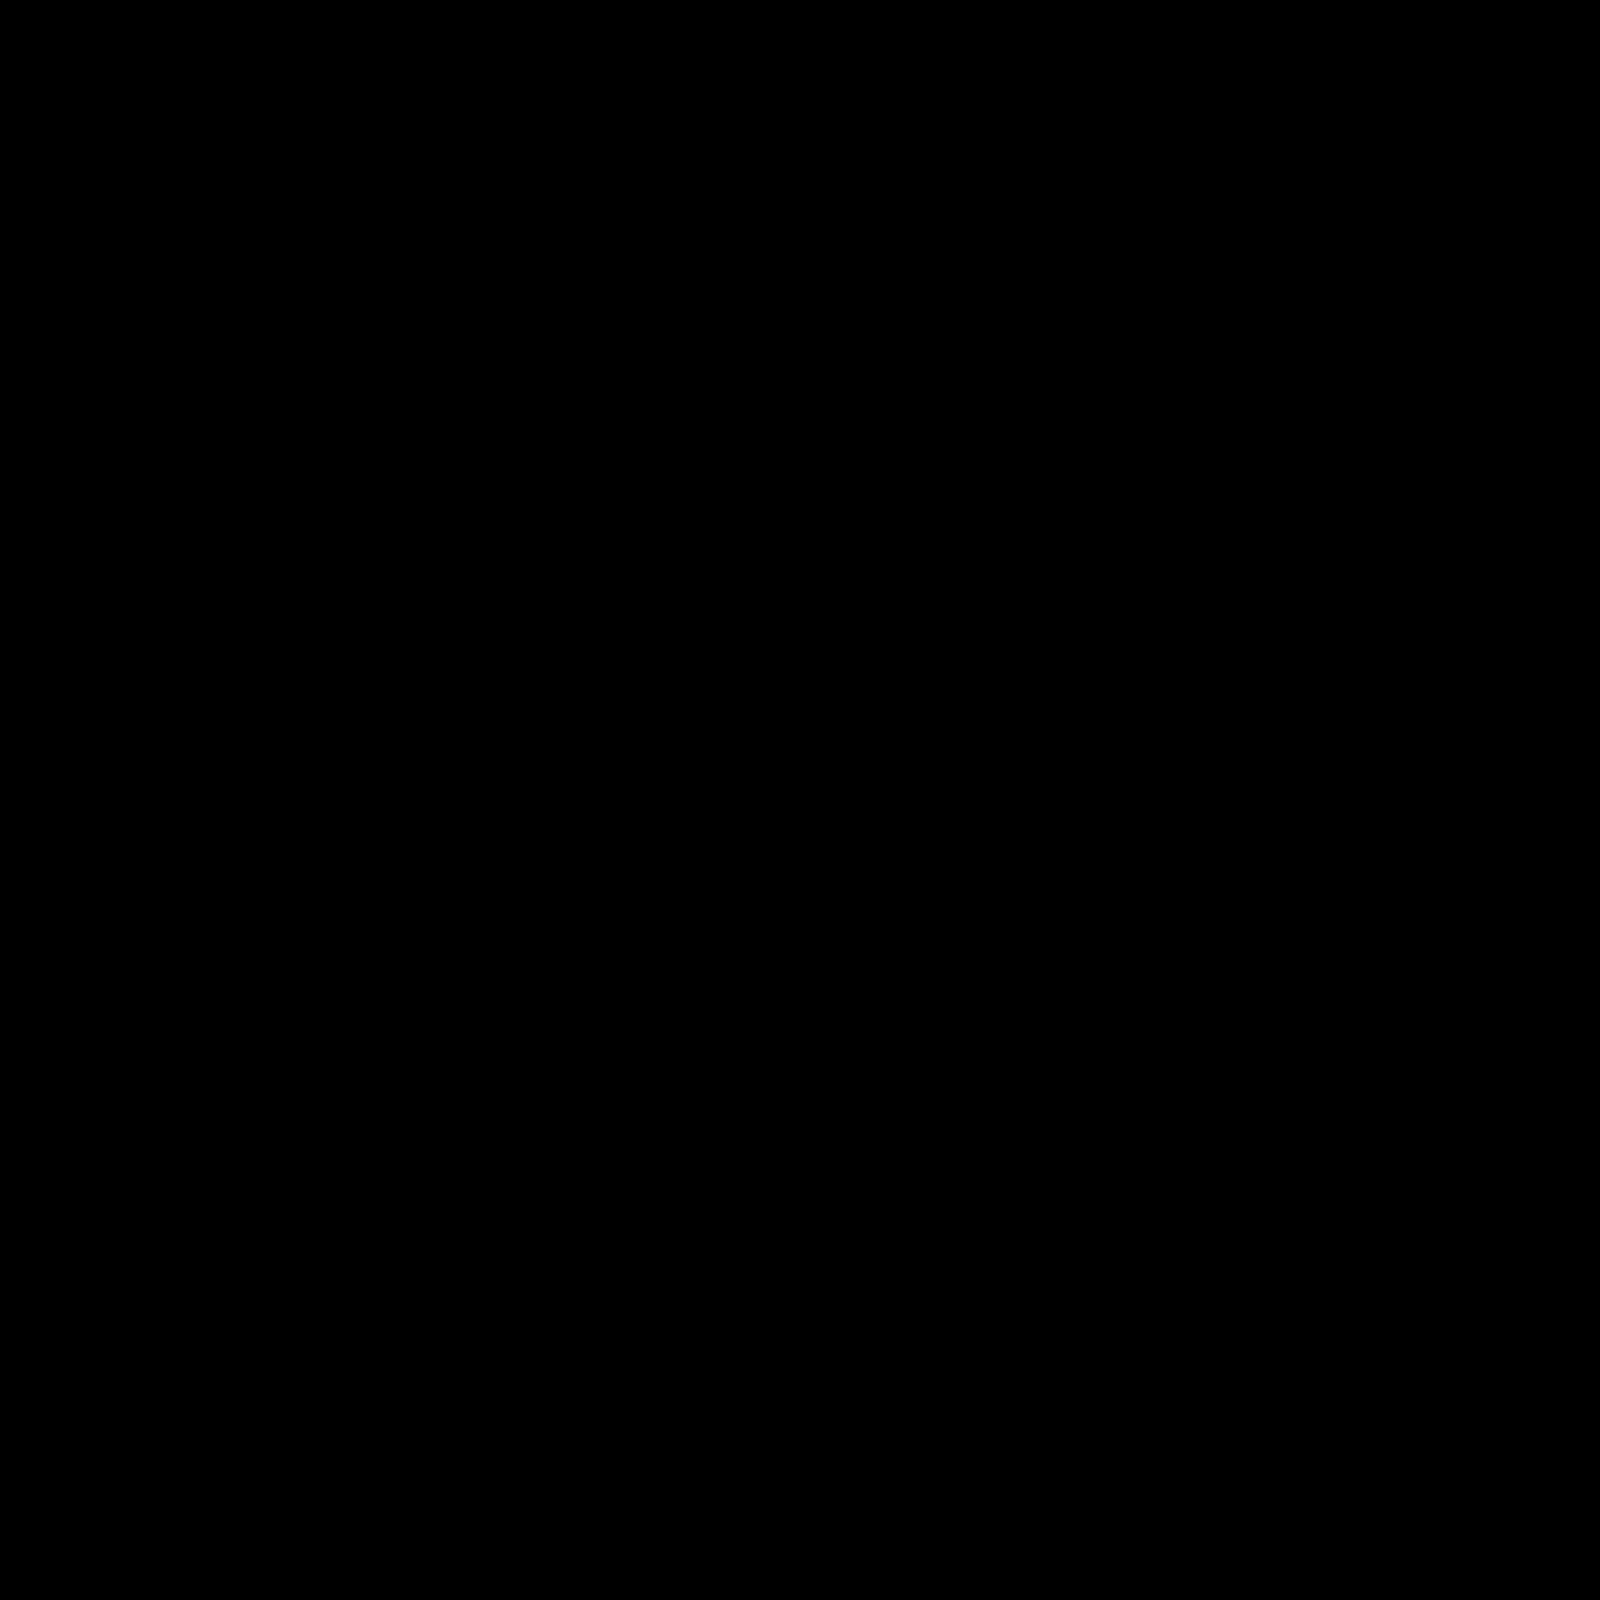 svg transparent Porsche